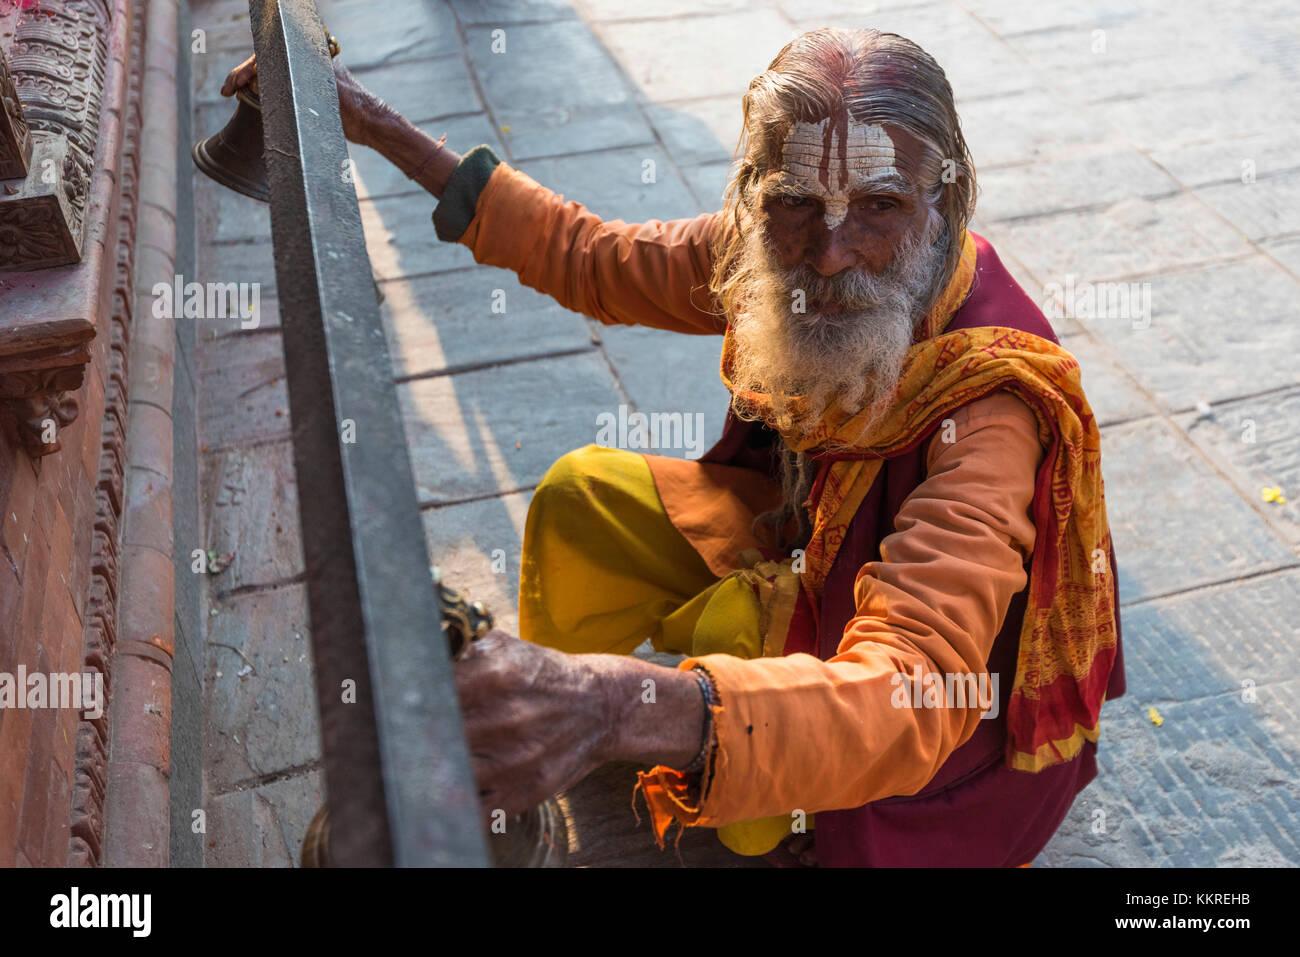 Budhanilkantha Temple, Katmandu, Nepal Sadhu plays bells for the ritual at Budhanilkantha temple - Stock Image